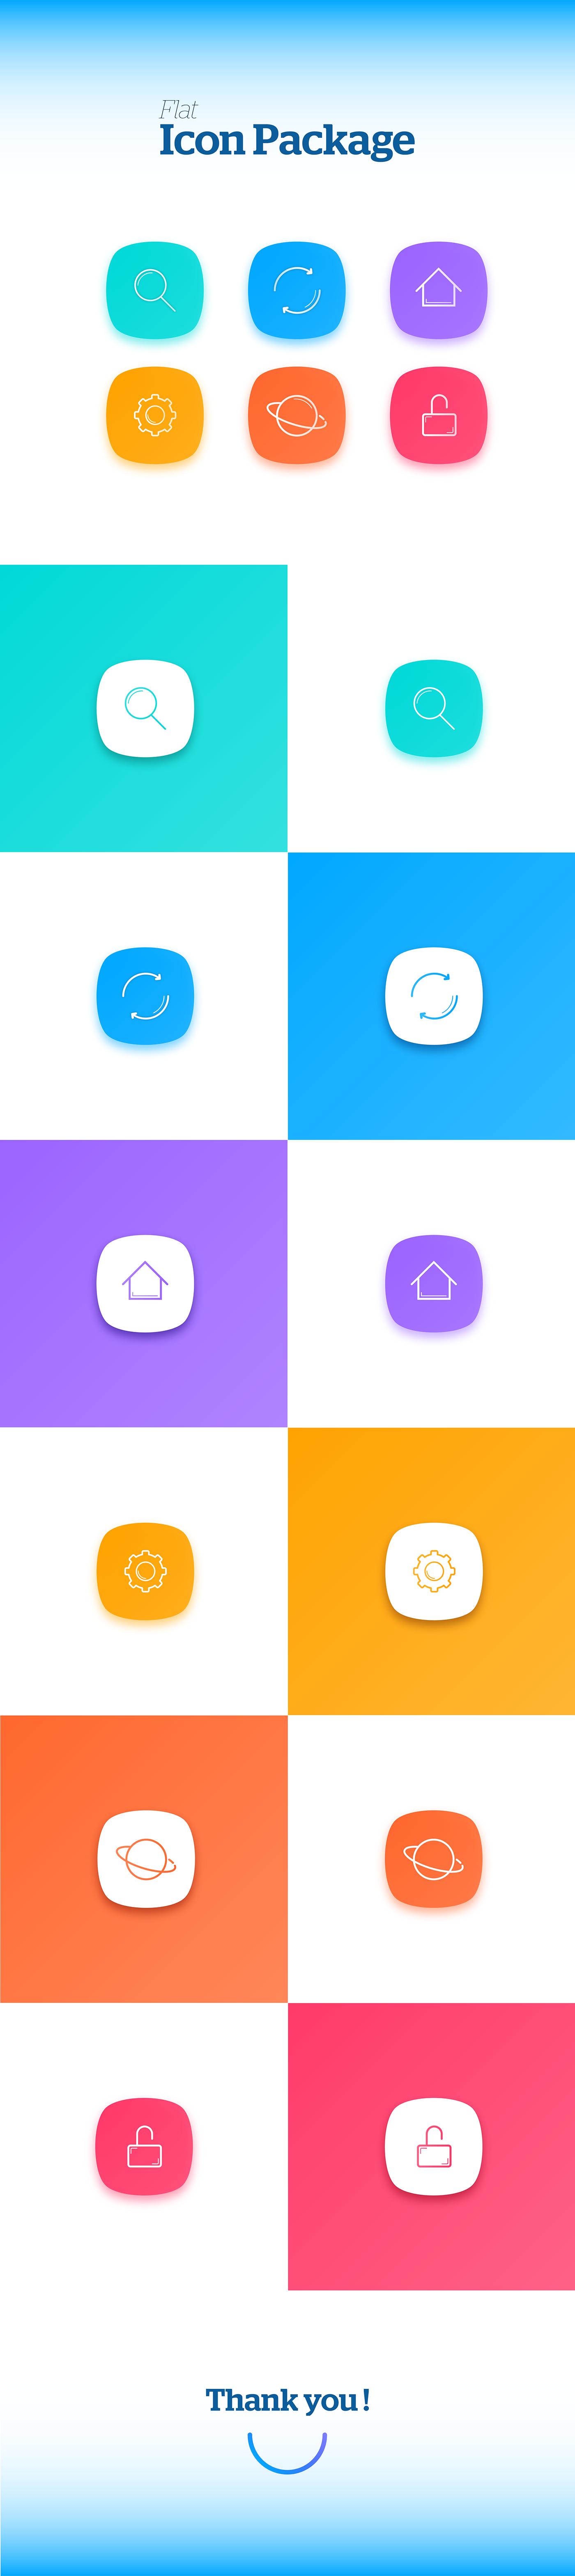 Icons design,flat illustration,Modern Design,graphic design